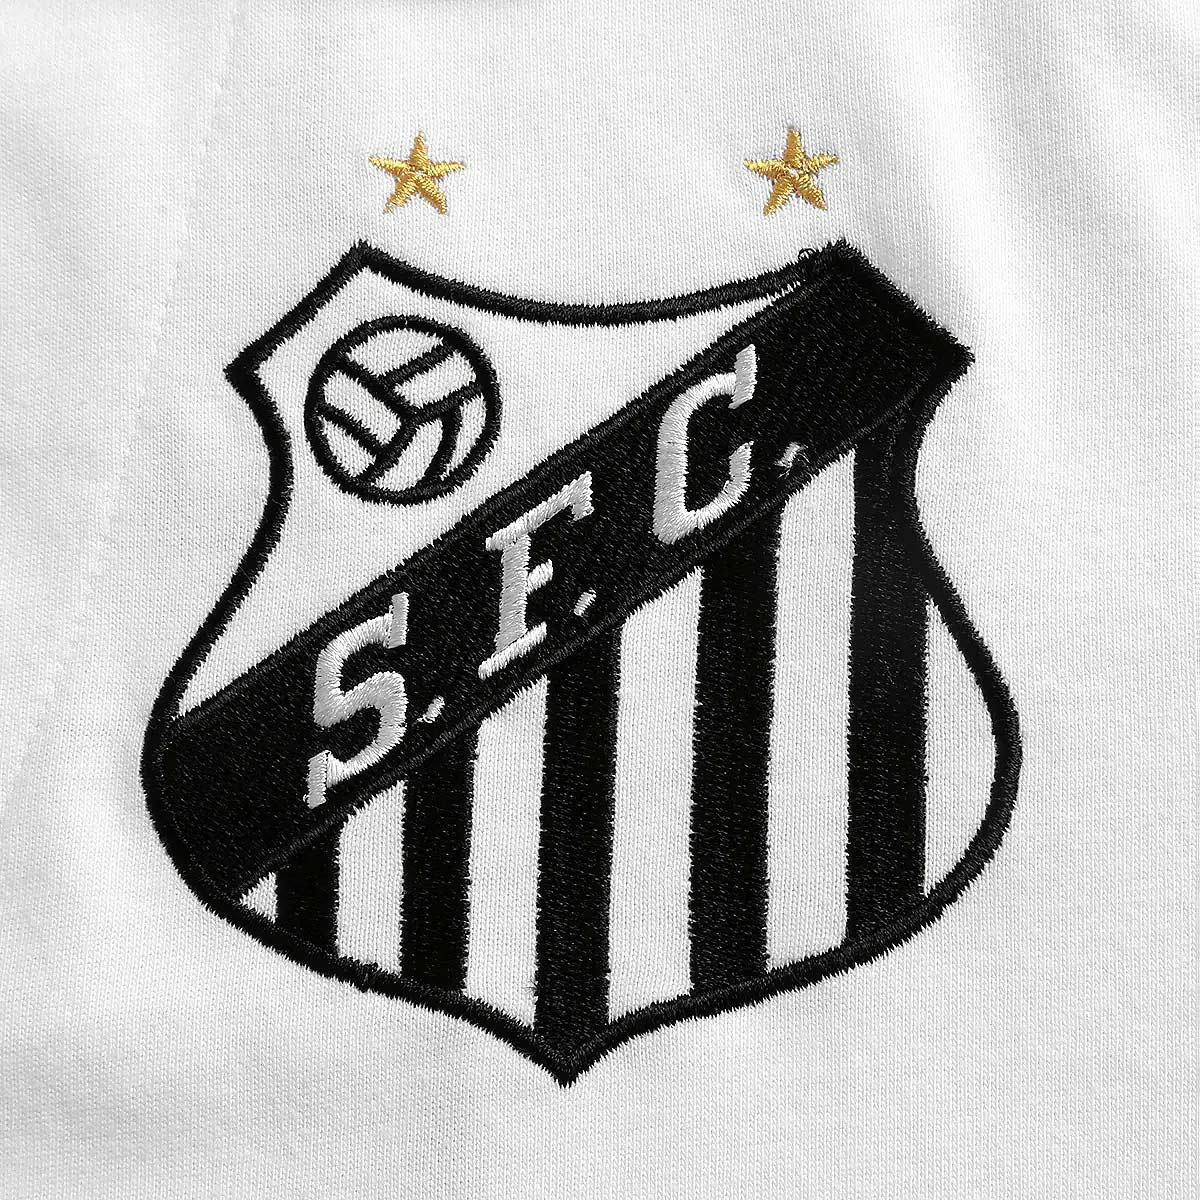 Camisa Retrô Santos Pelé Masculina